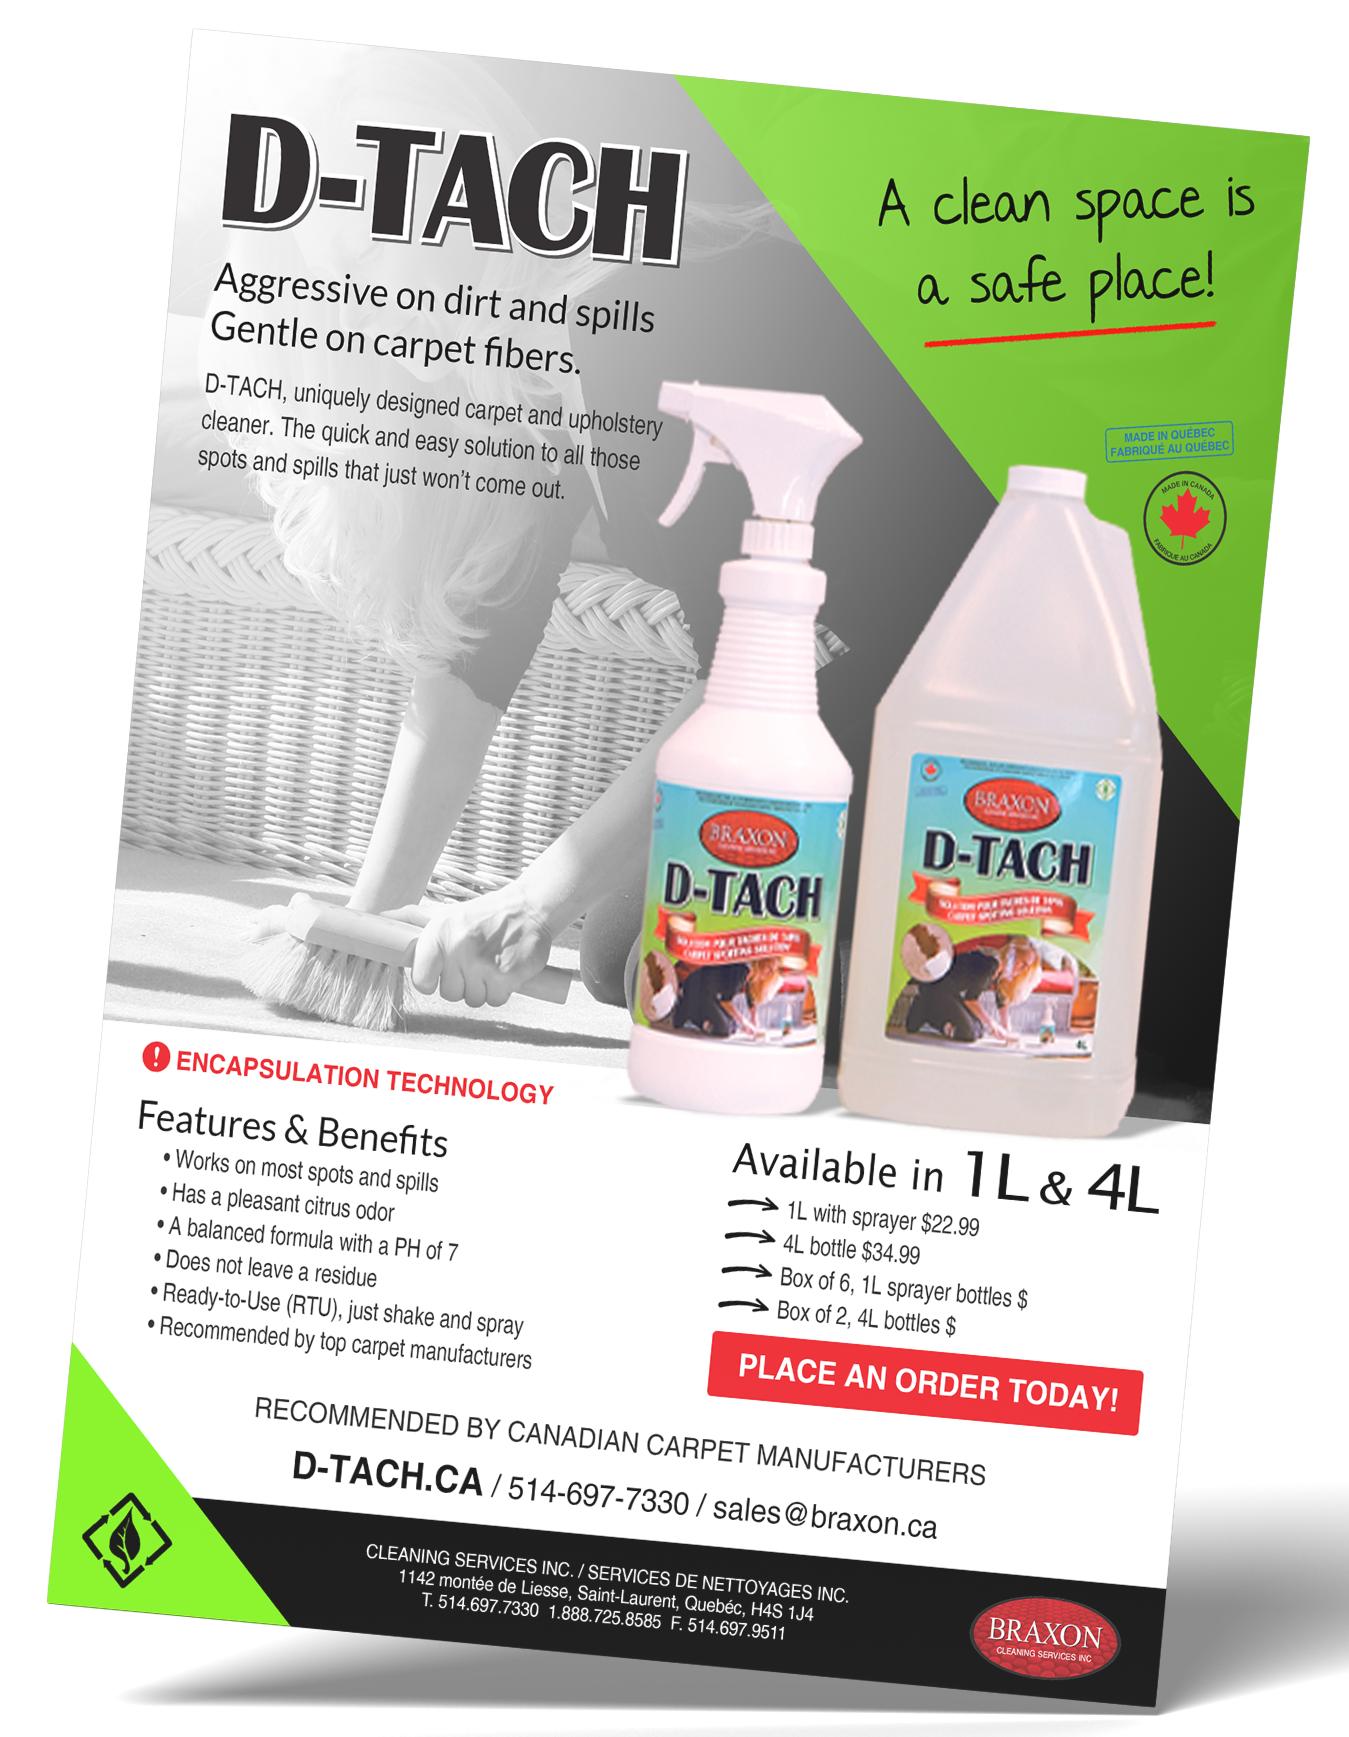 braxon-carpet-cleaning-solution-D-TACH